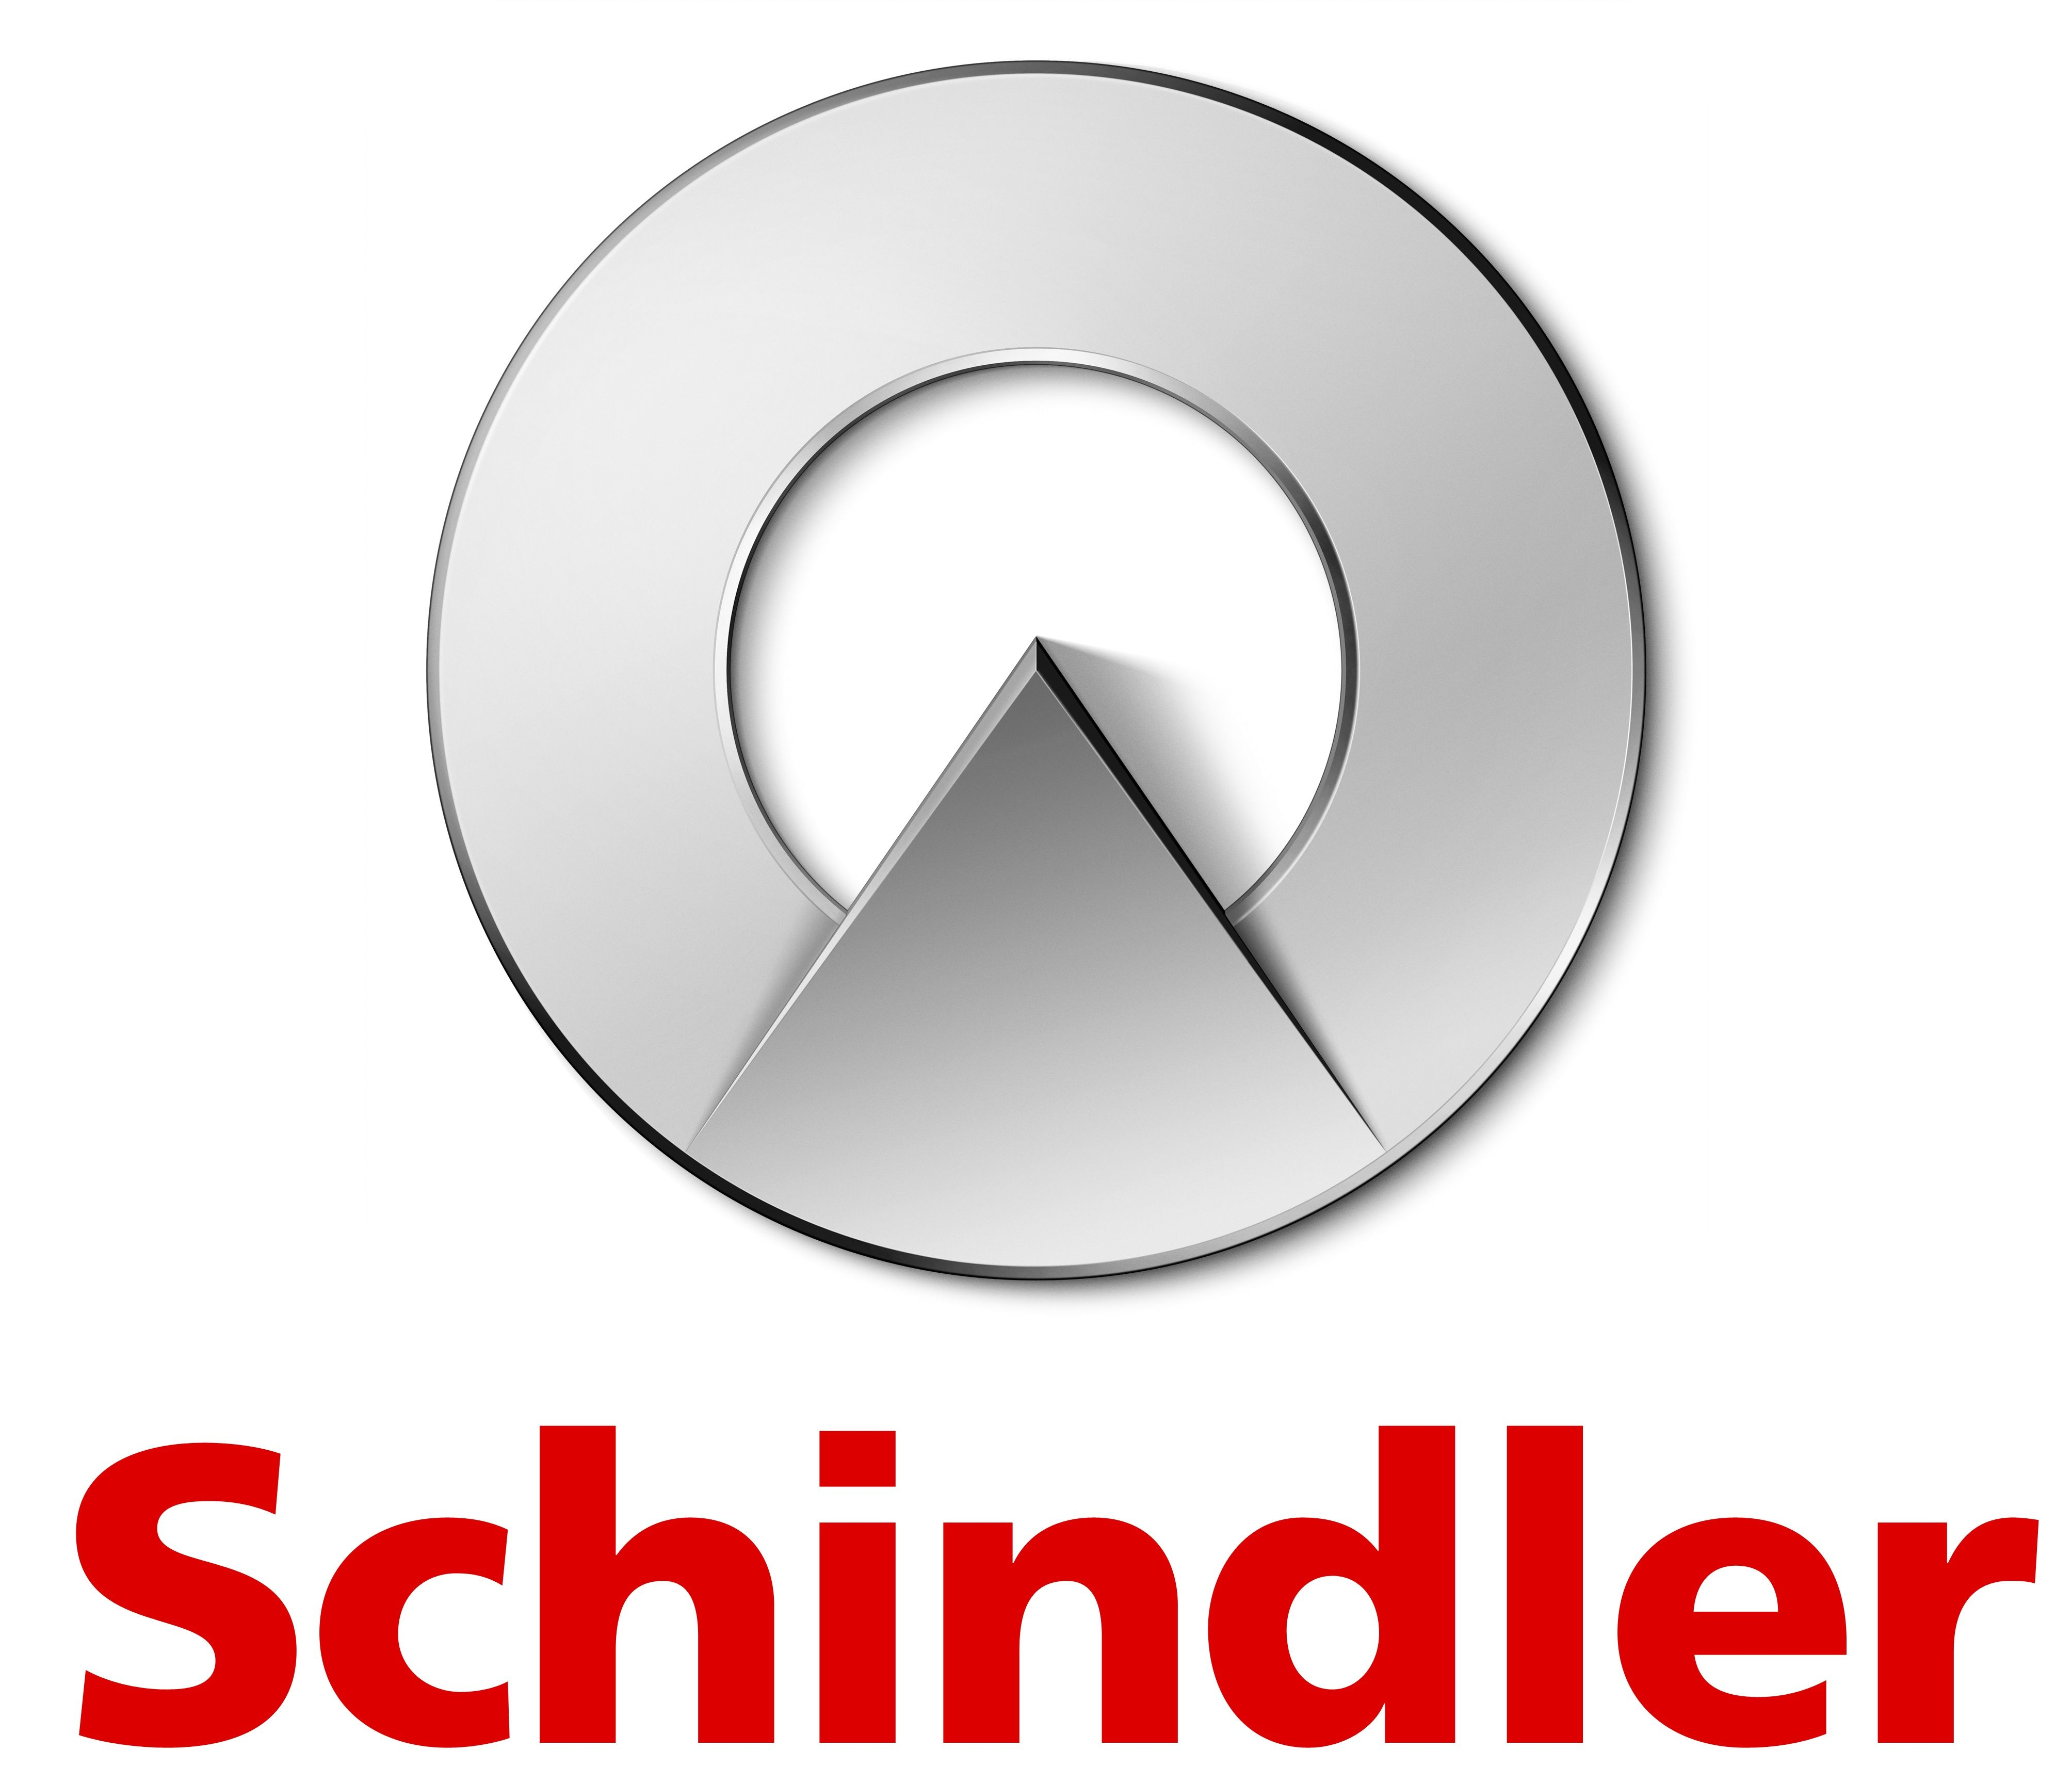 schindler lifts logo brand strategy pinterest logos. Black Bedroom Furniture Sets. Home Design Ideas